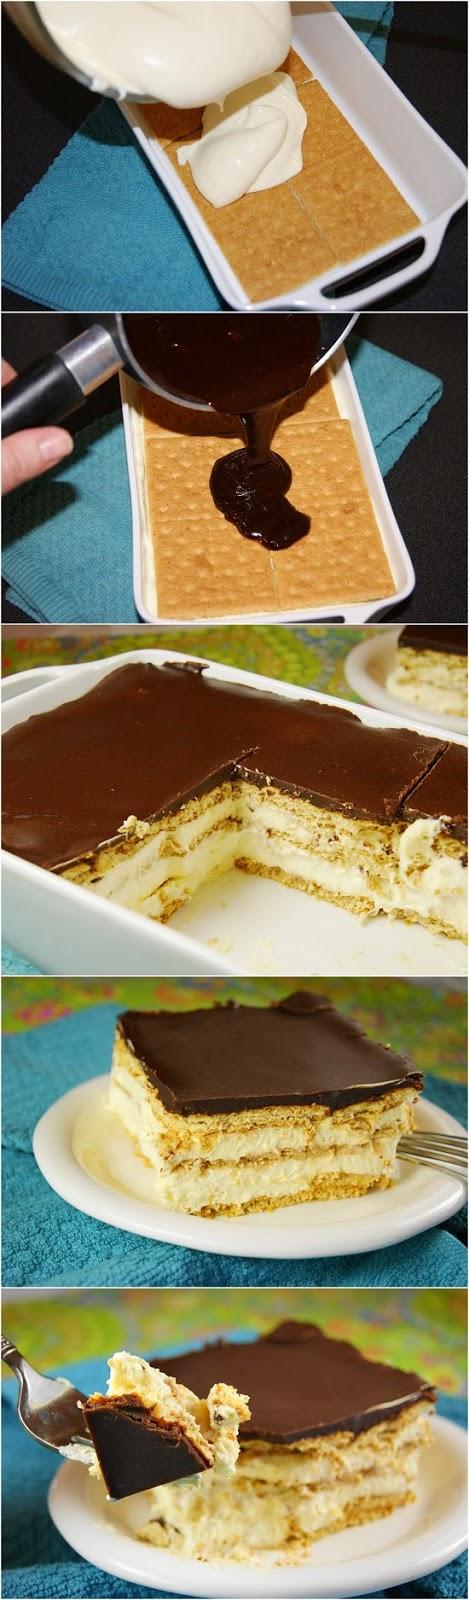 No Bake Chocolate Peanut Butter Eclair Cake